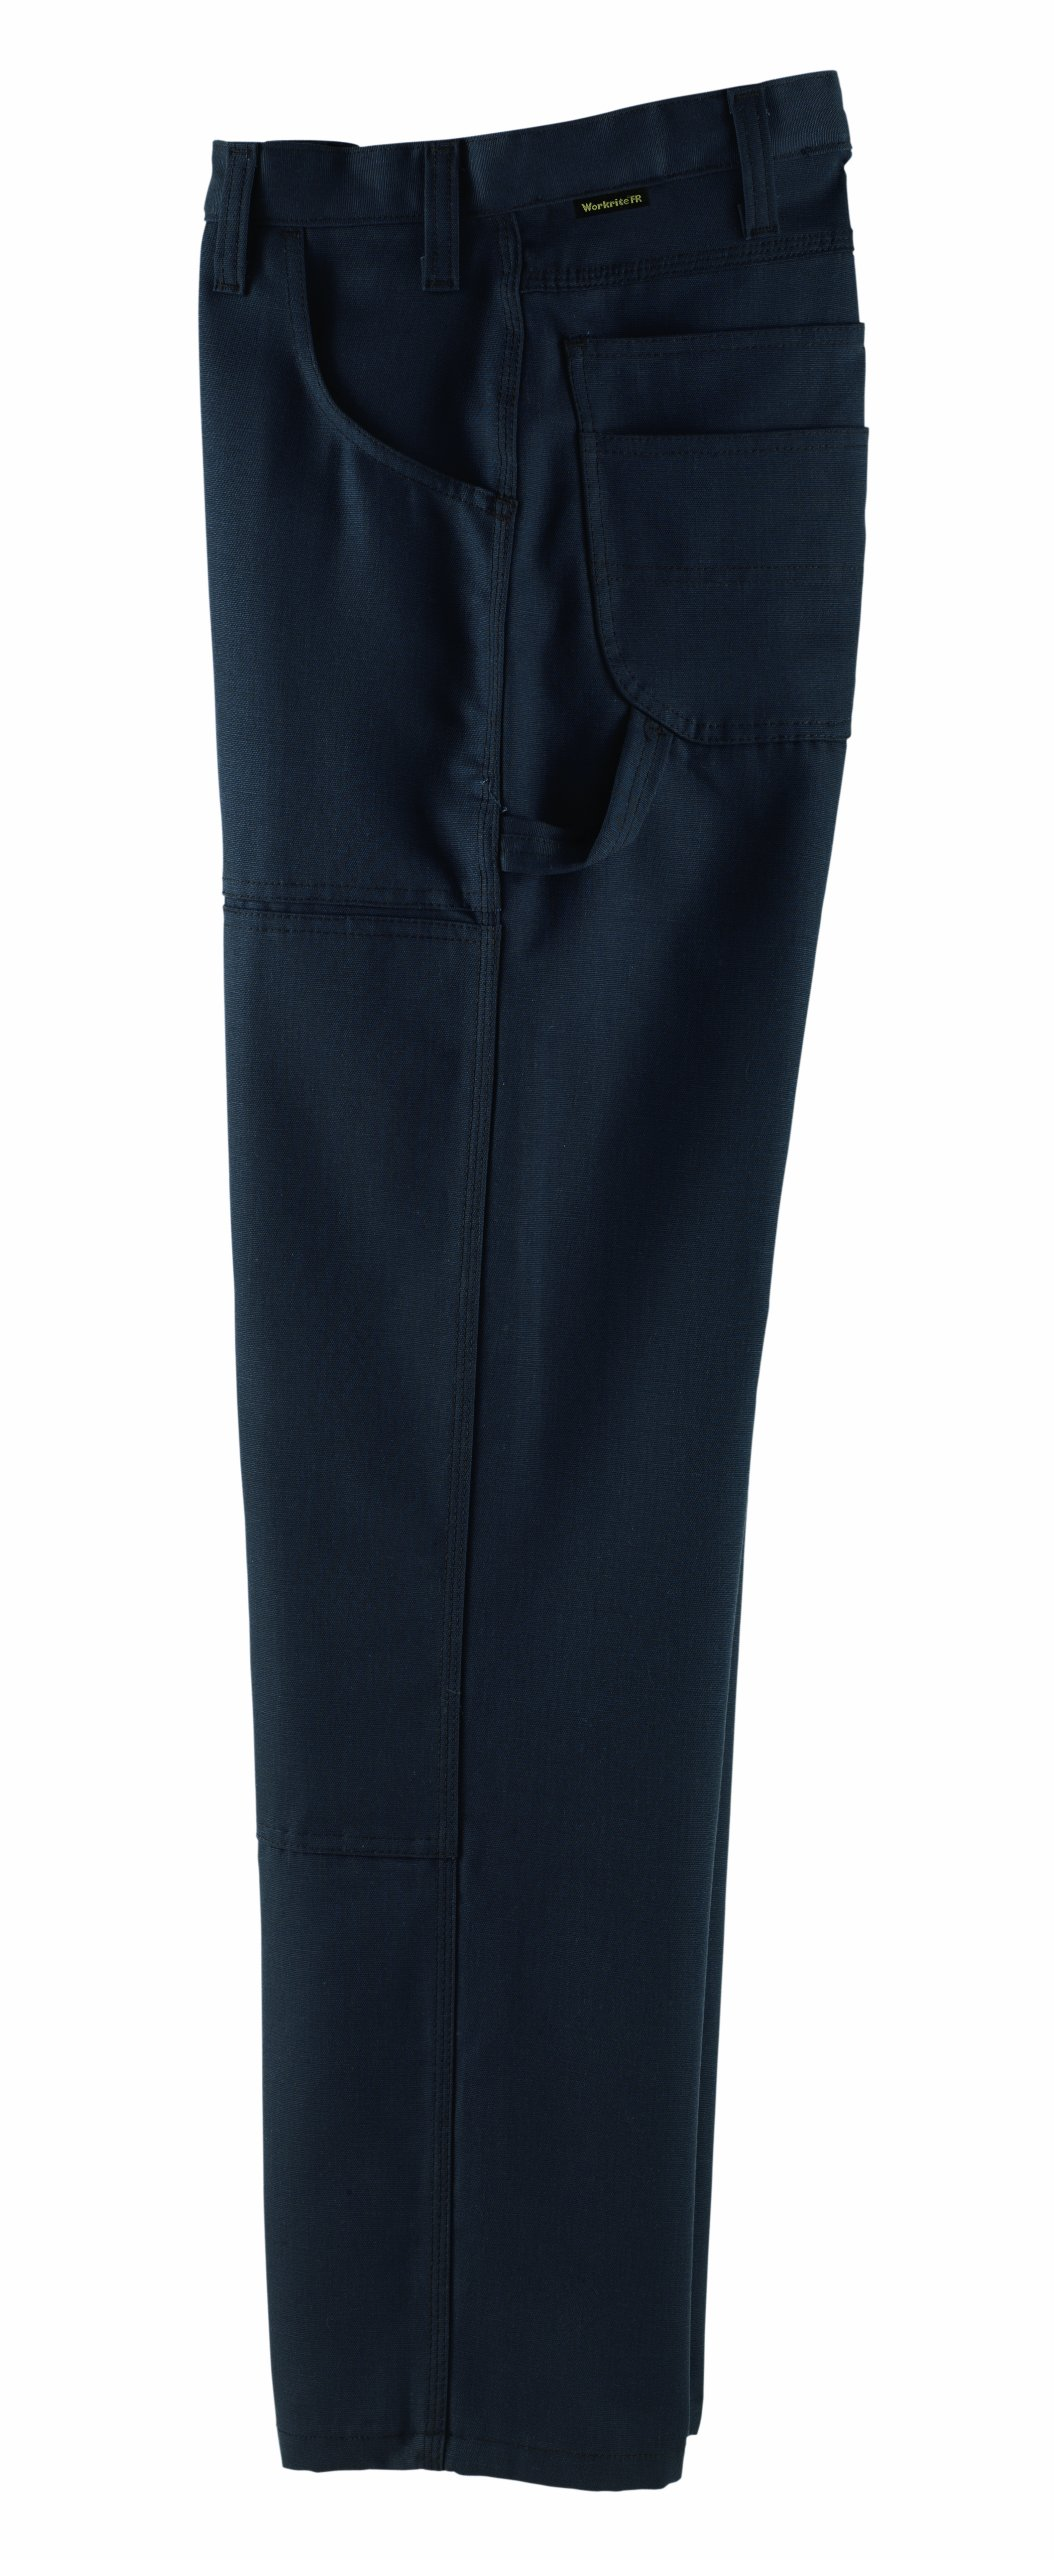 Workrite 416UT80NB35-XX Flame Resistant 8 oz UltraSoft Basket Weave Double Knee Pant, 35 Waist Size, Open Inseam, Navy Blue